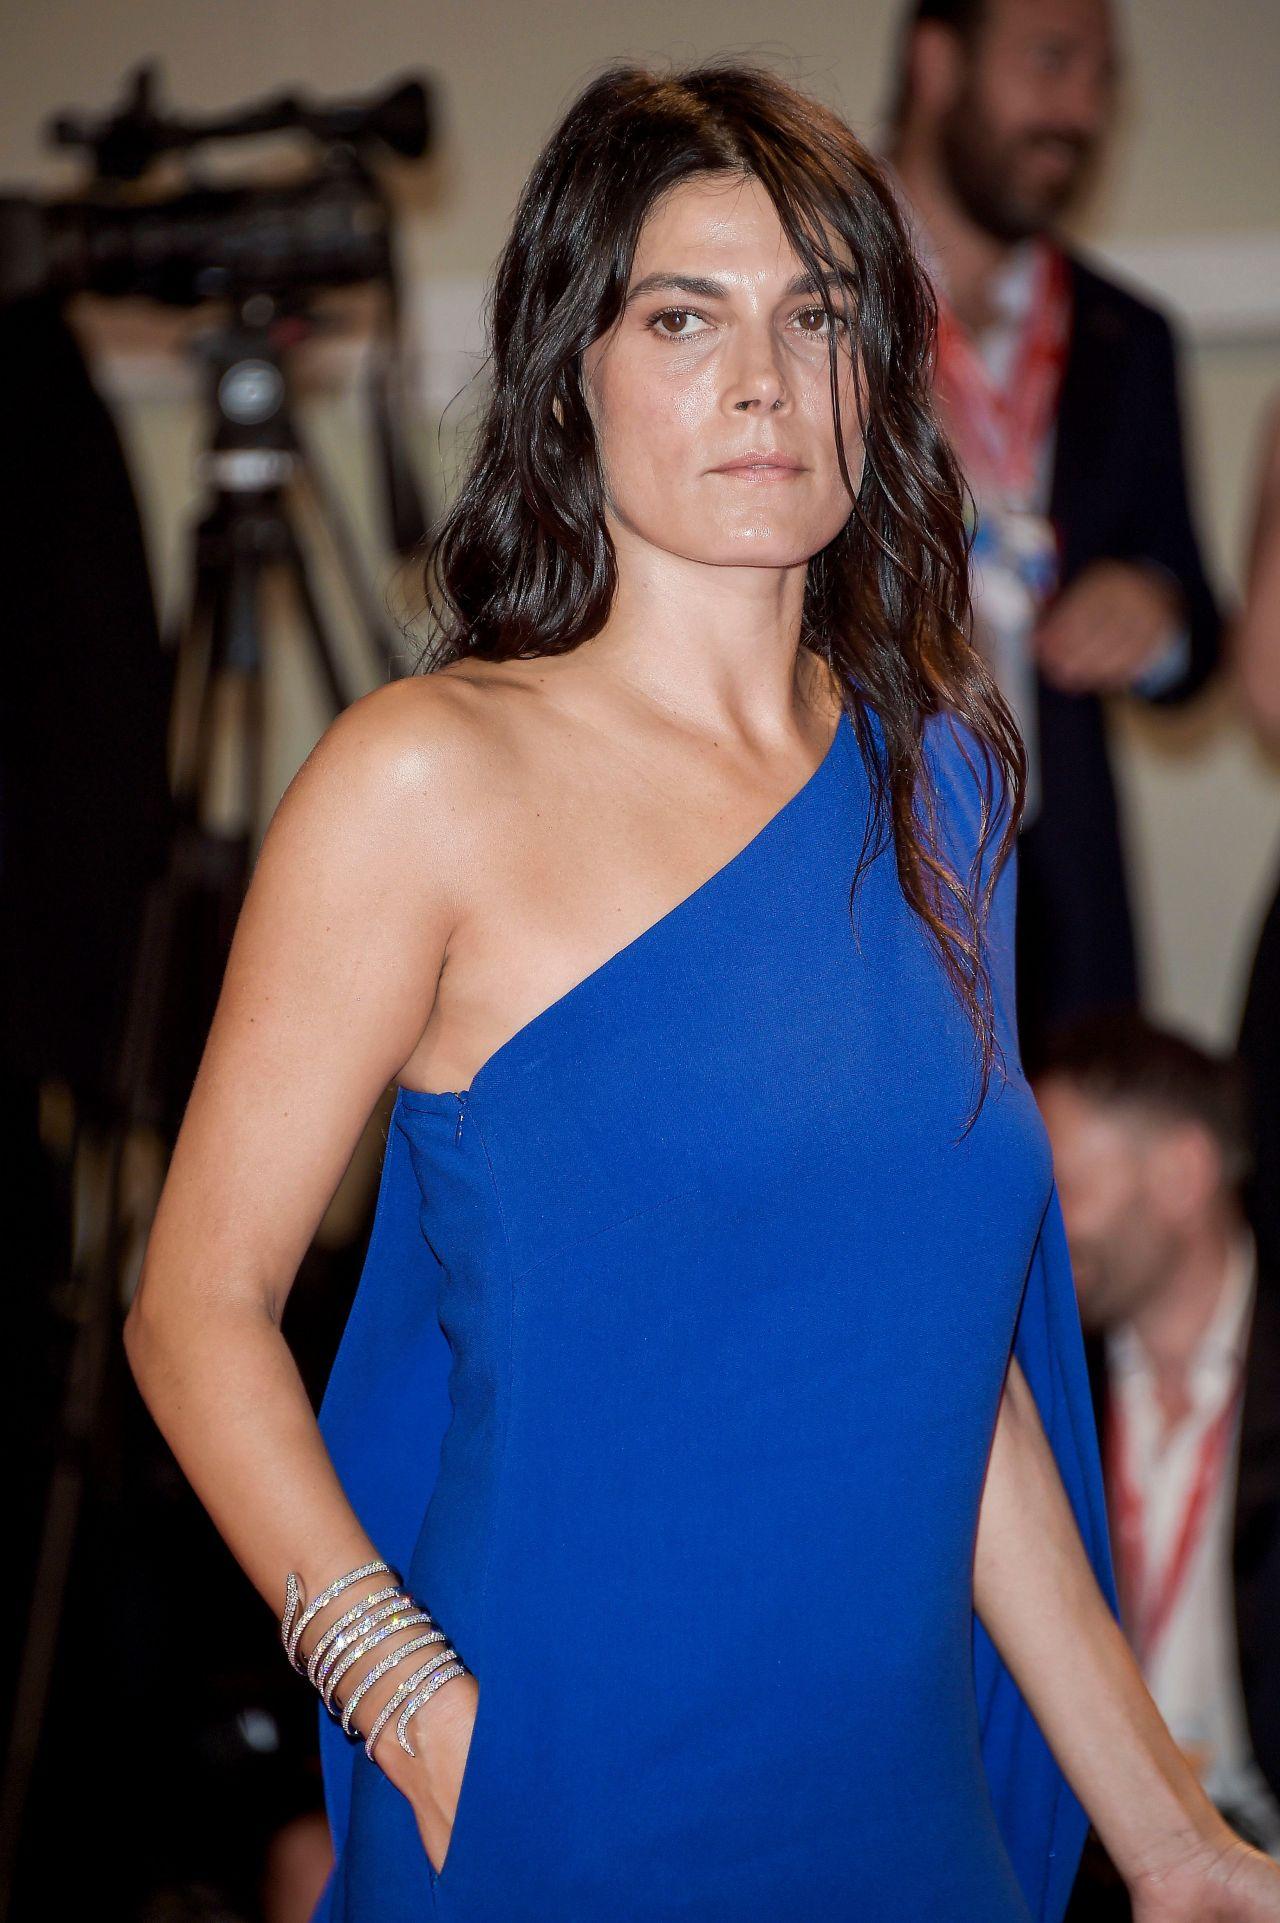 Valeria Solarino - Kineo Prize Red Carpet at the 76th